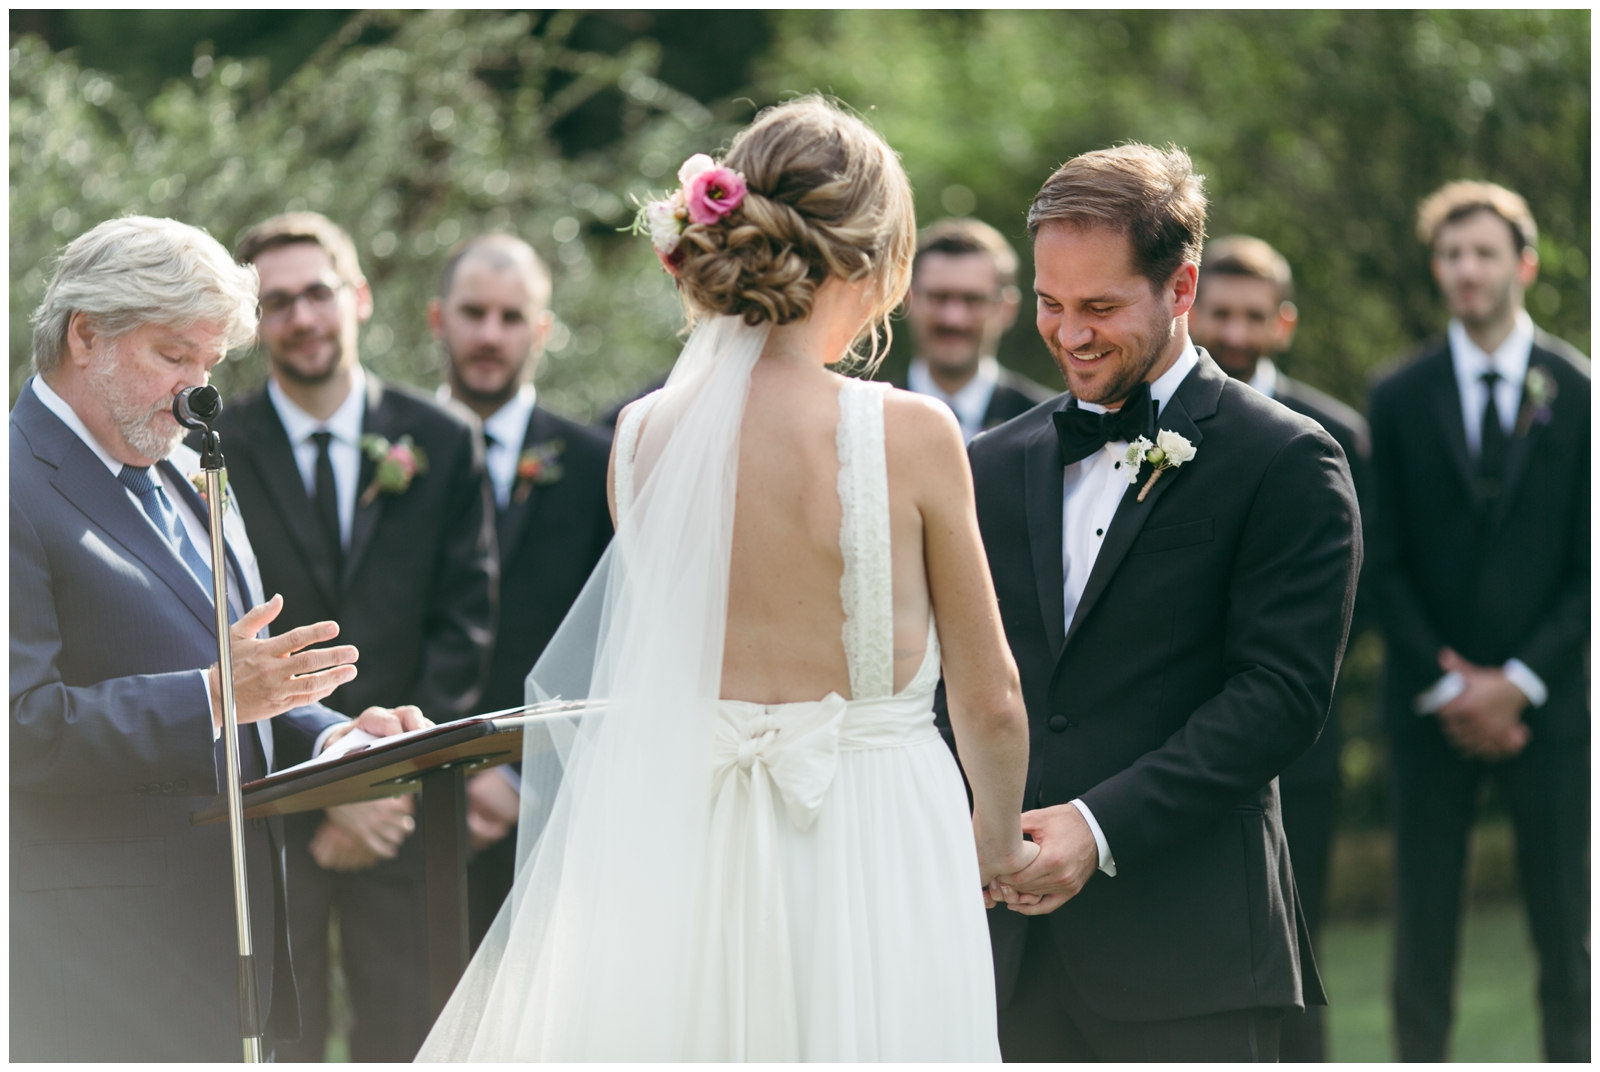 Moraine-Farm-wedding-Bailey-Q-Photo-Massachusetts-wedding-photpgrapher-066.jpg